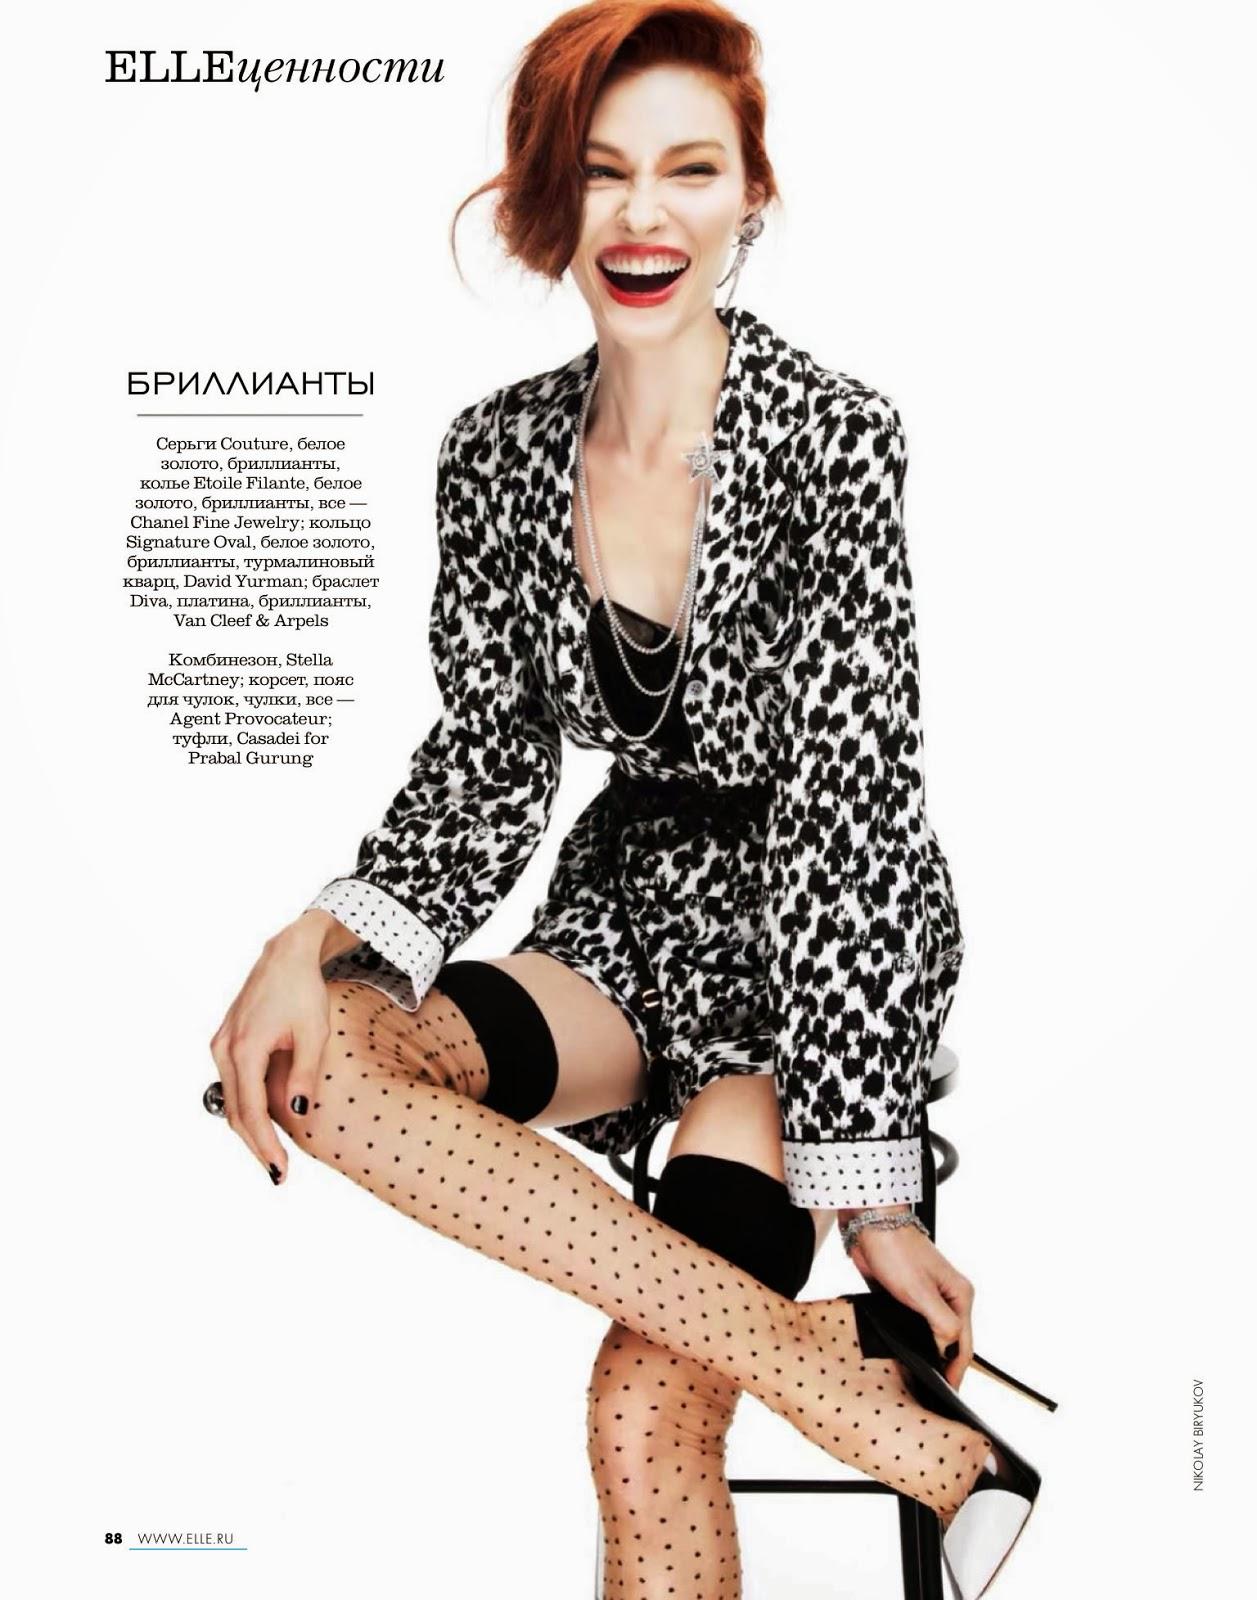 Magazine Photoshoot : Lera Tribel Photoshot For Nikolay Biryukov Elle Magazine Russia February 2014 Issue